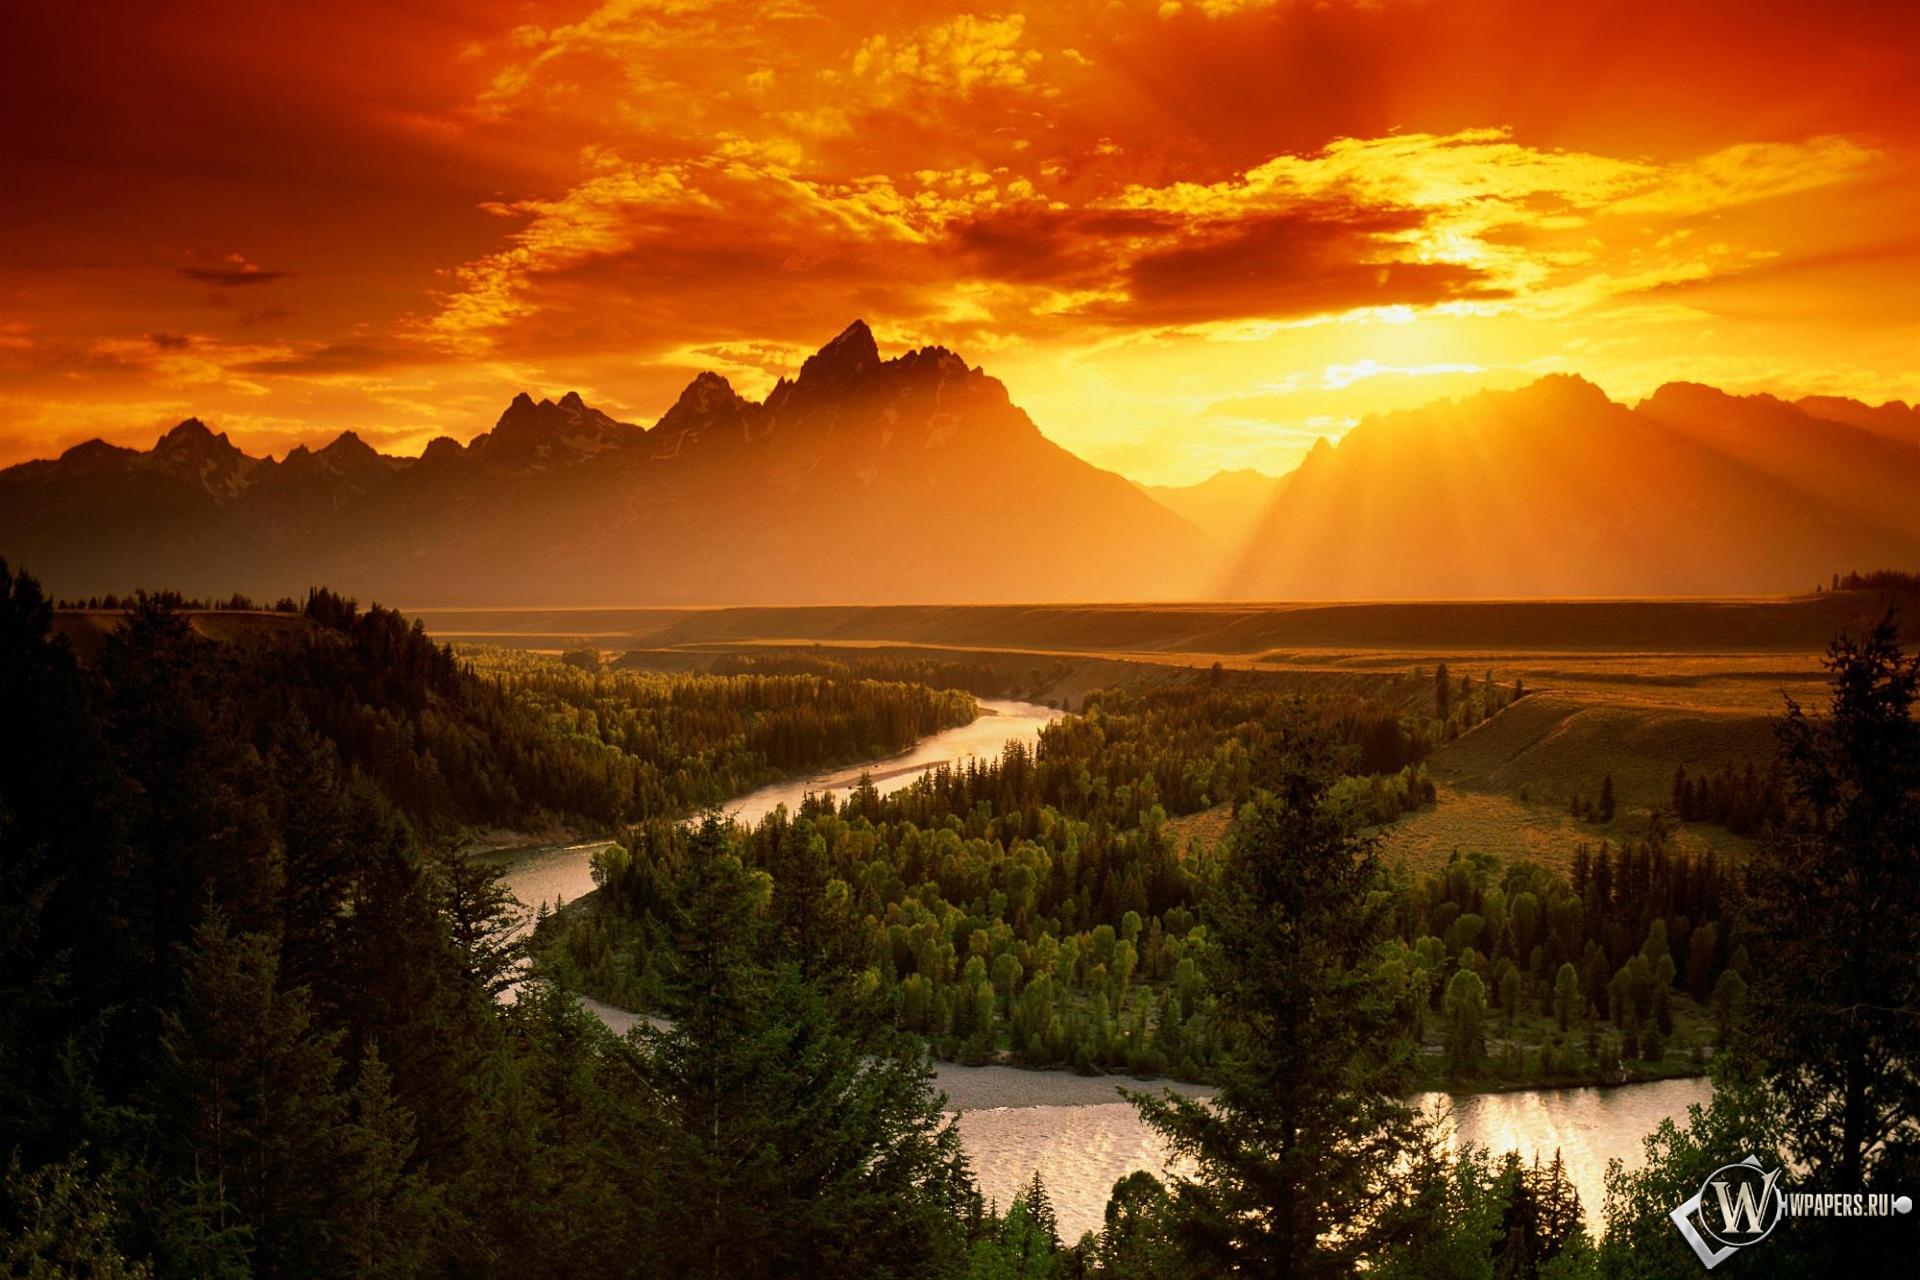 Закат в горах 1920x1280